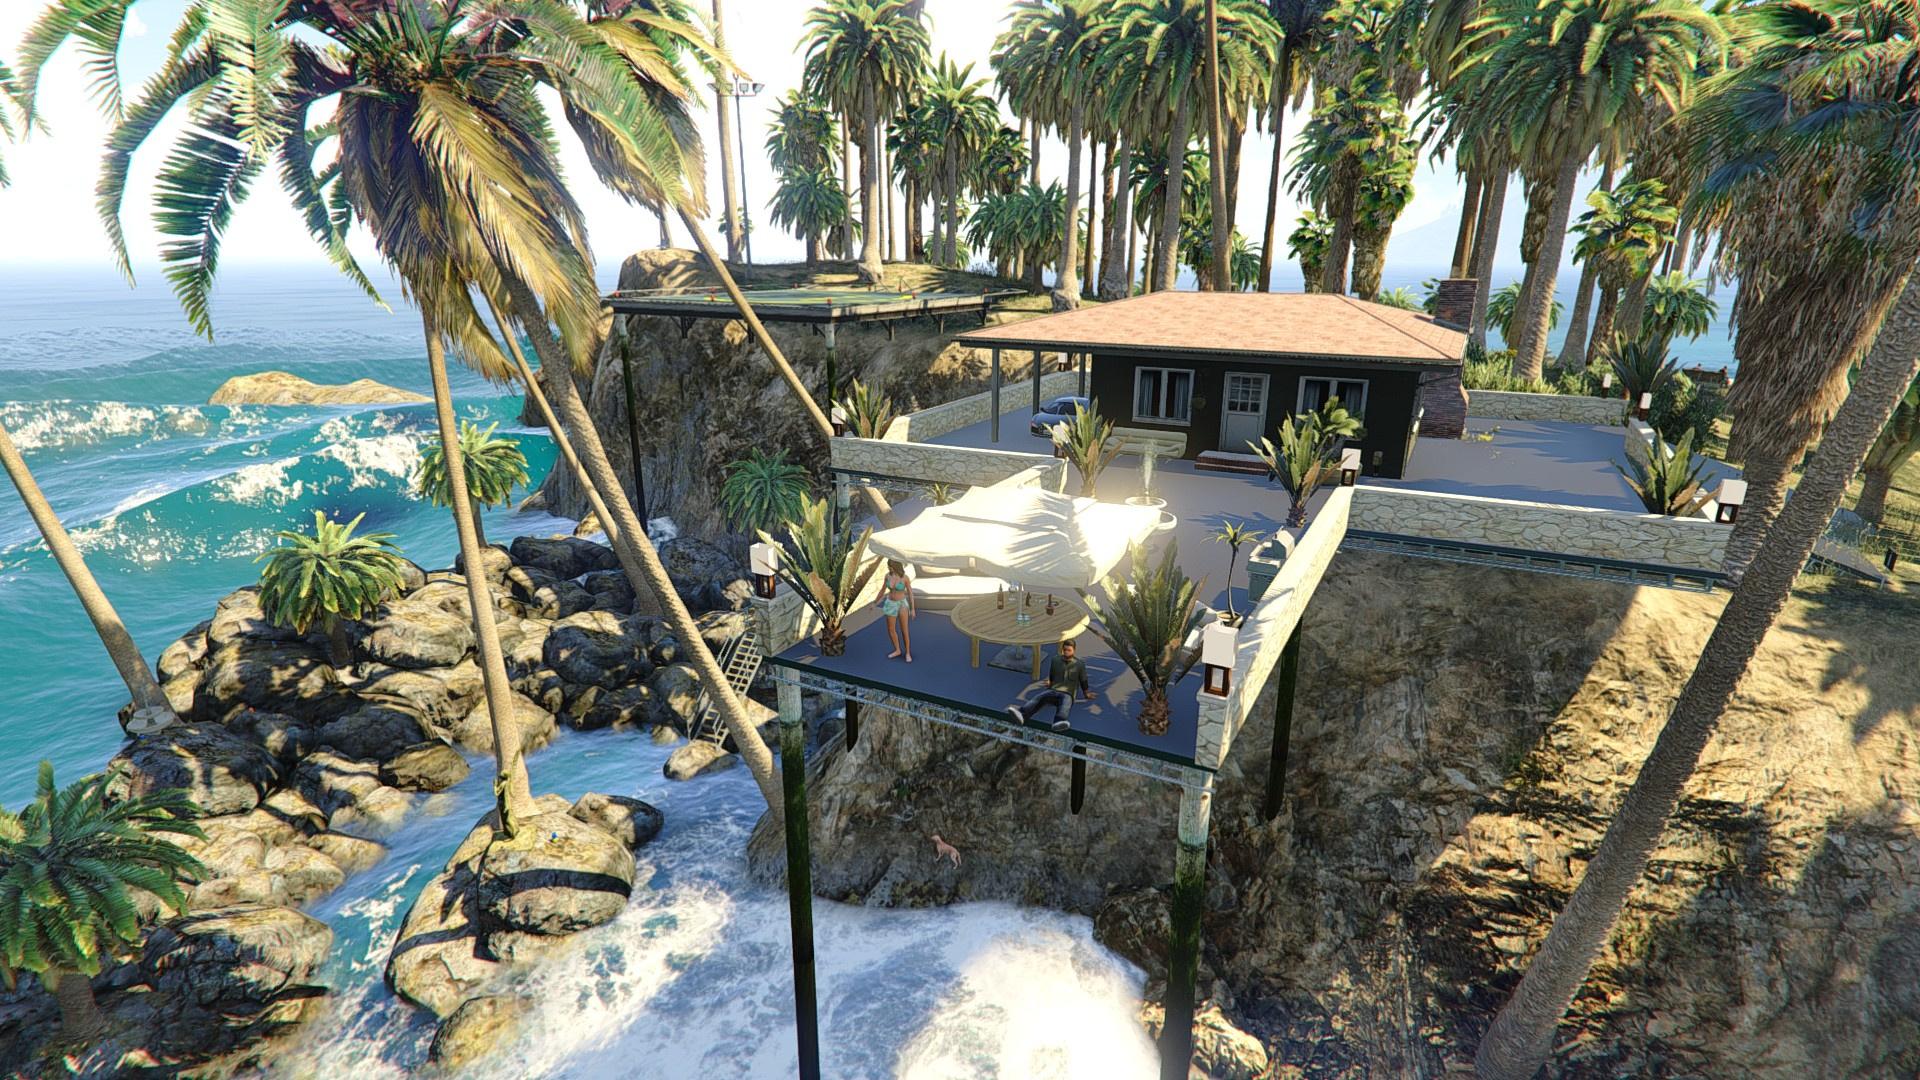 Palm island motorbike challenge gta5 for Whats a terrace house